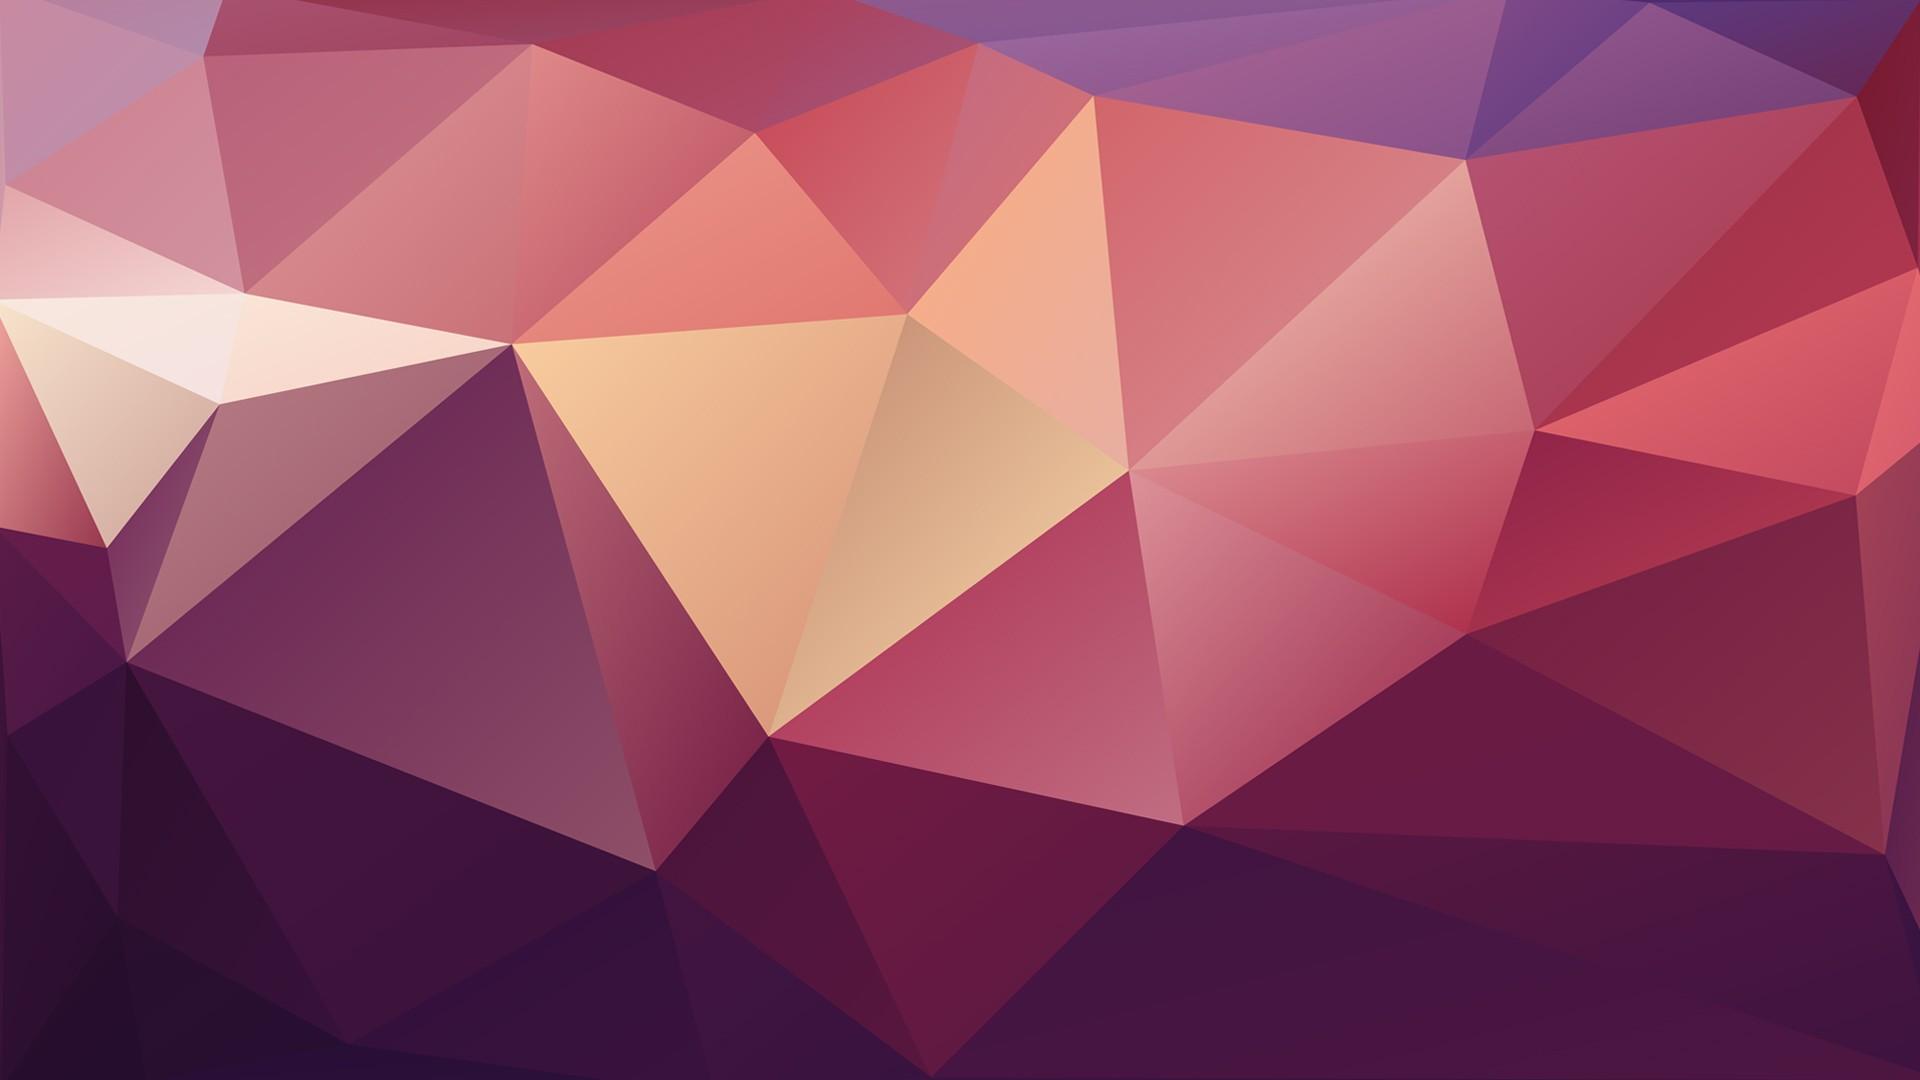 Must see Wallpaper Mac Geometric - 287486-free-geometric-background-1920x1080  Photograph_583823.jpg